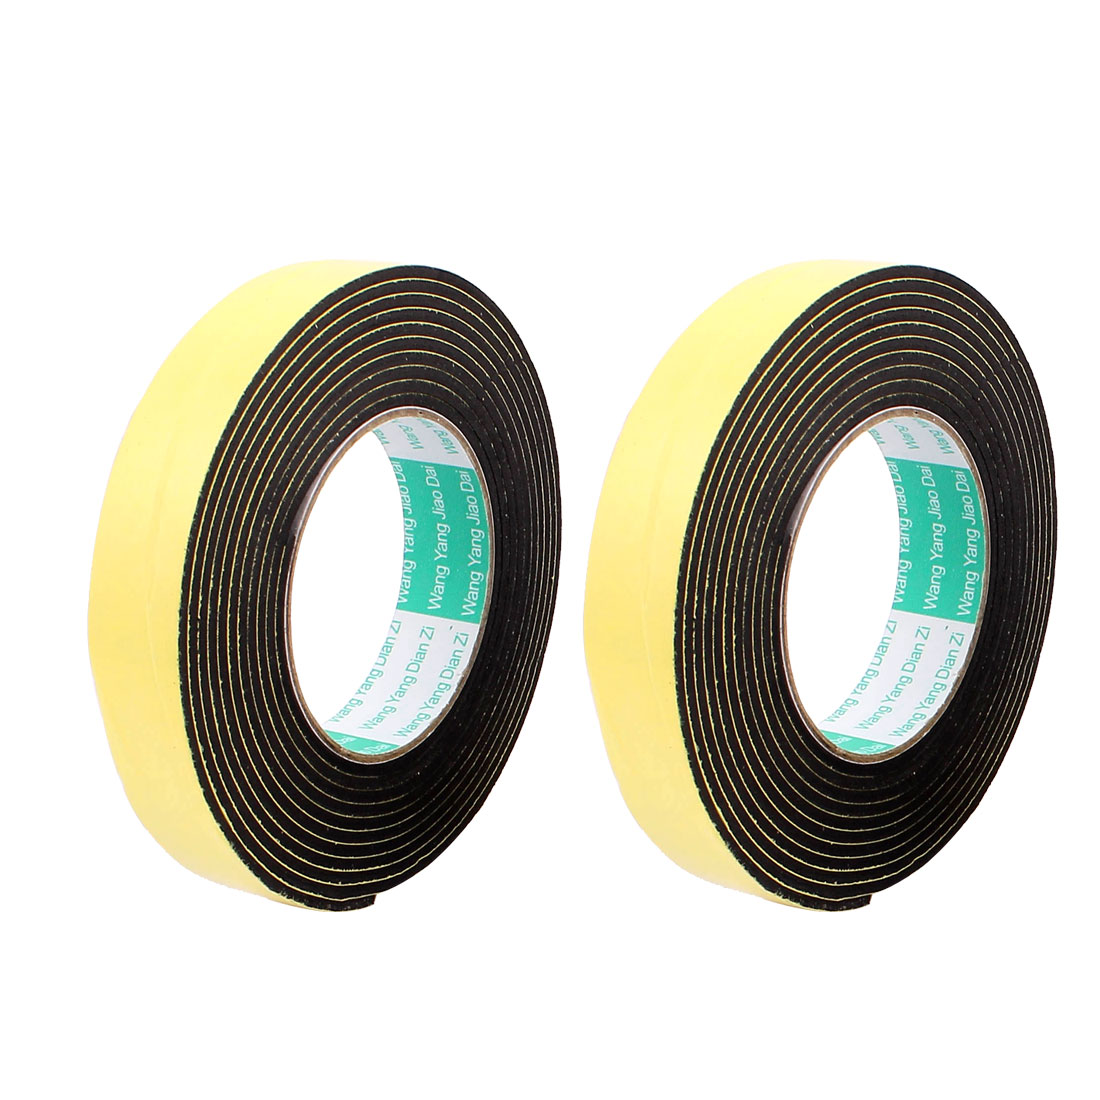 2Pcs 2.5CM Width 4M Length 3MM Thick Single Sided Sealing Shockproof Sponge Tape